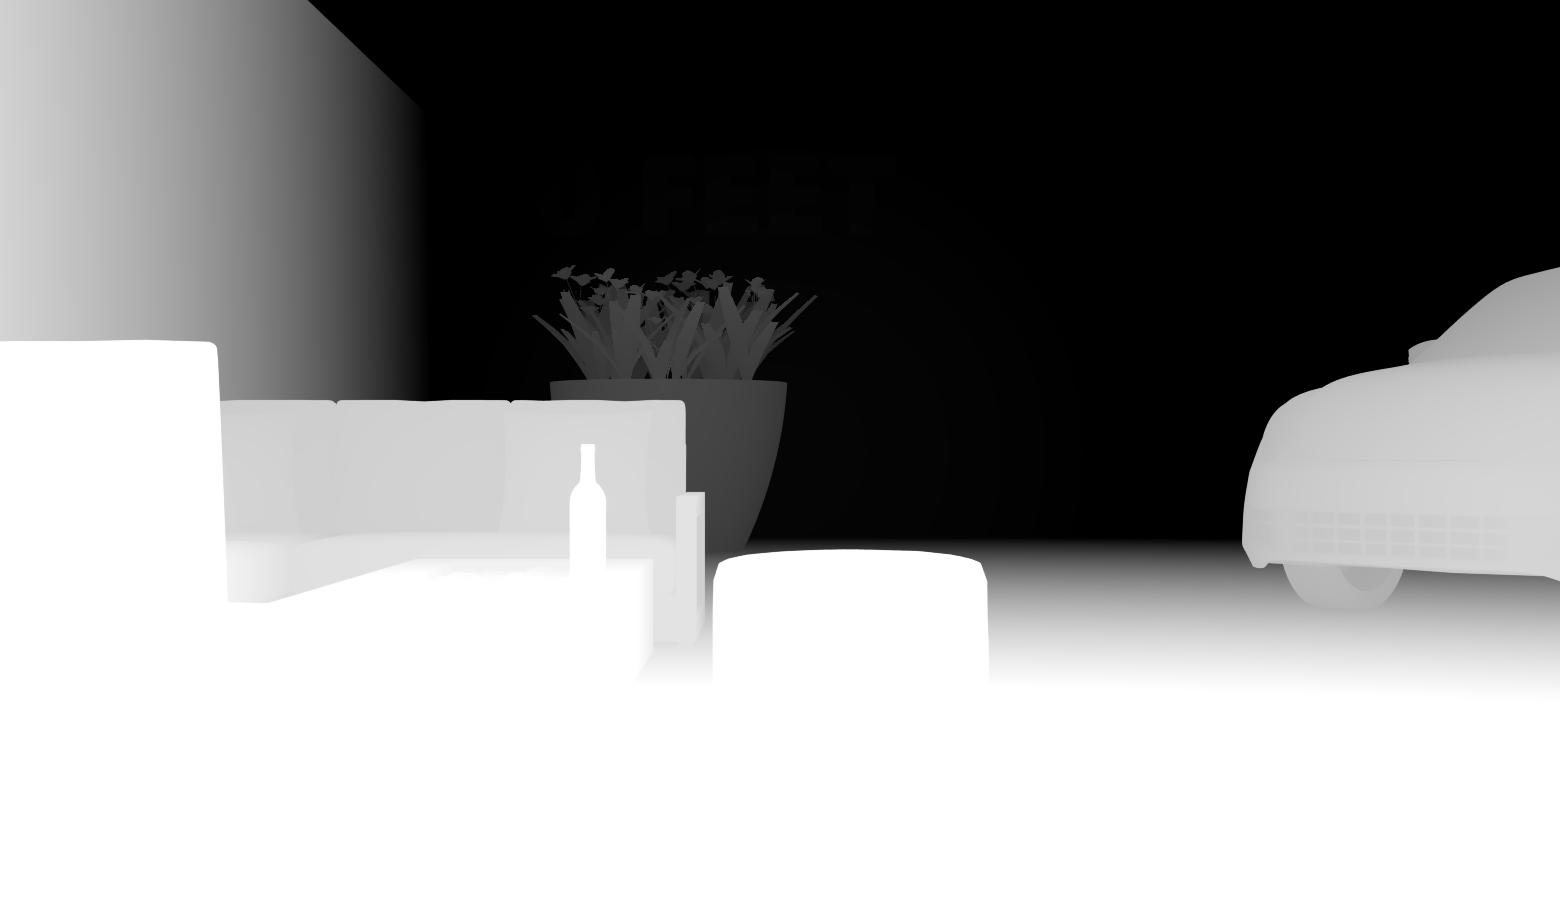 zbuffer-5-15-linear-scene3.png